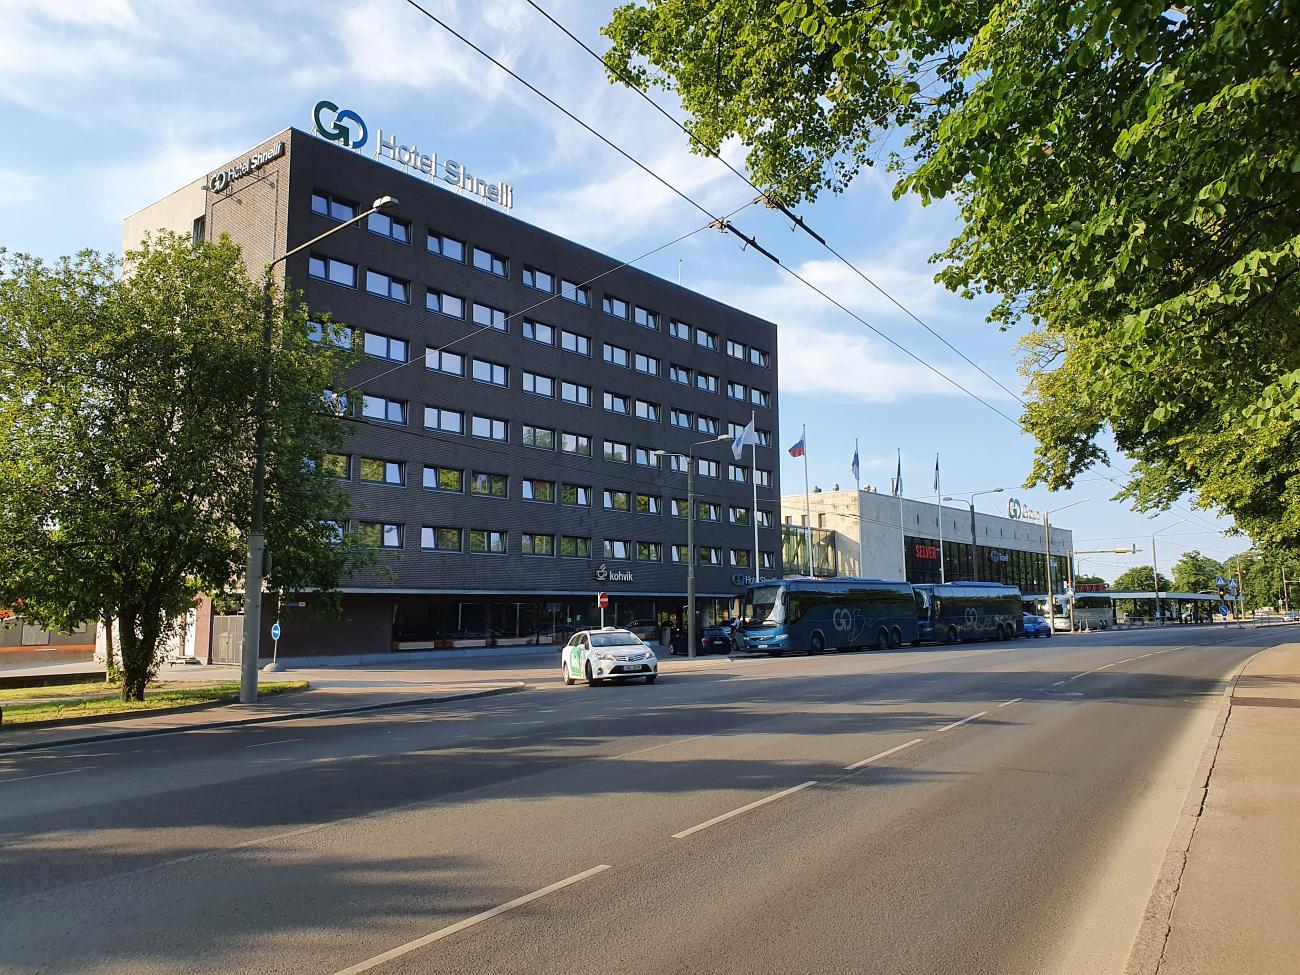 go-hotell-shnelli-by-balti-jaam